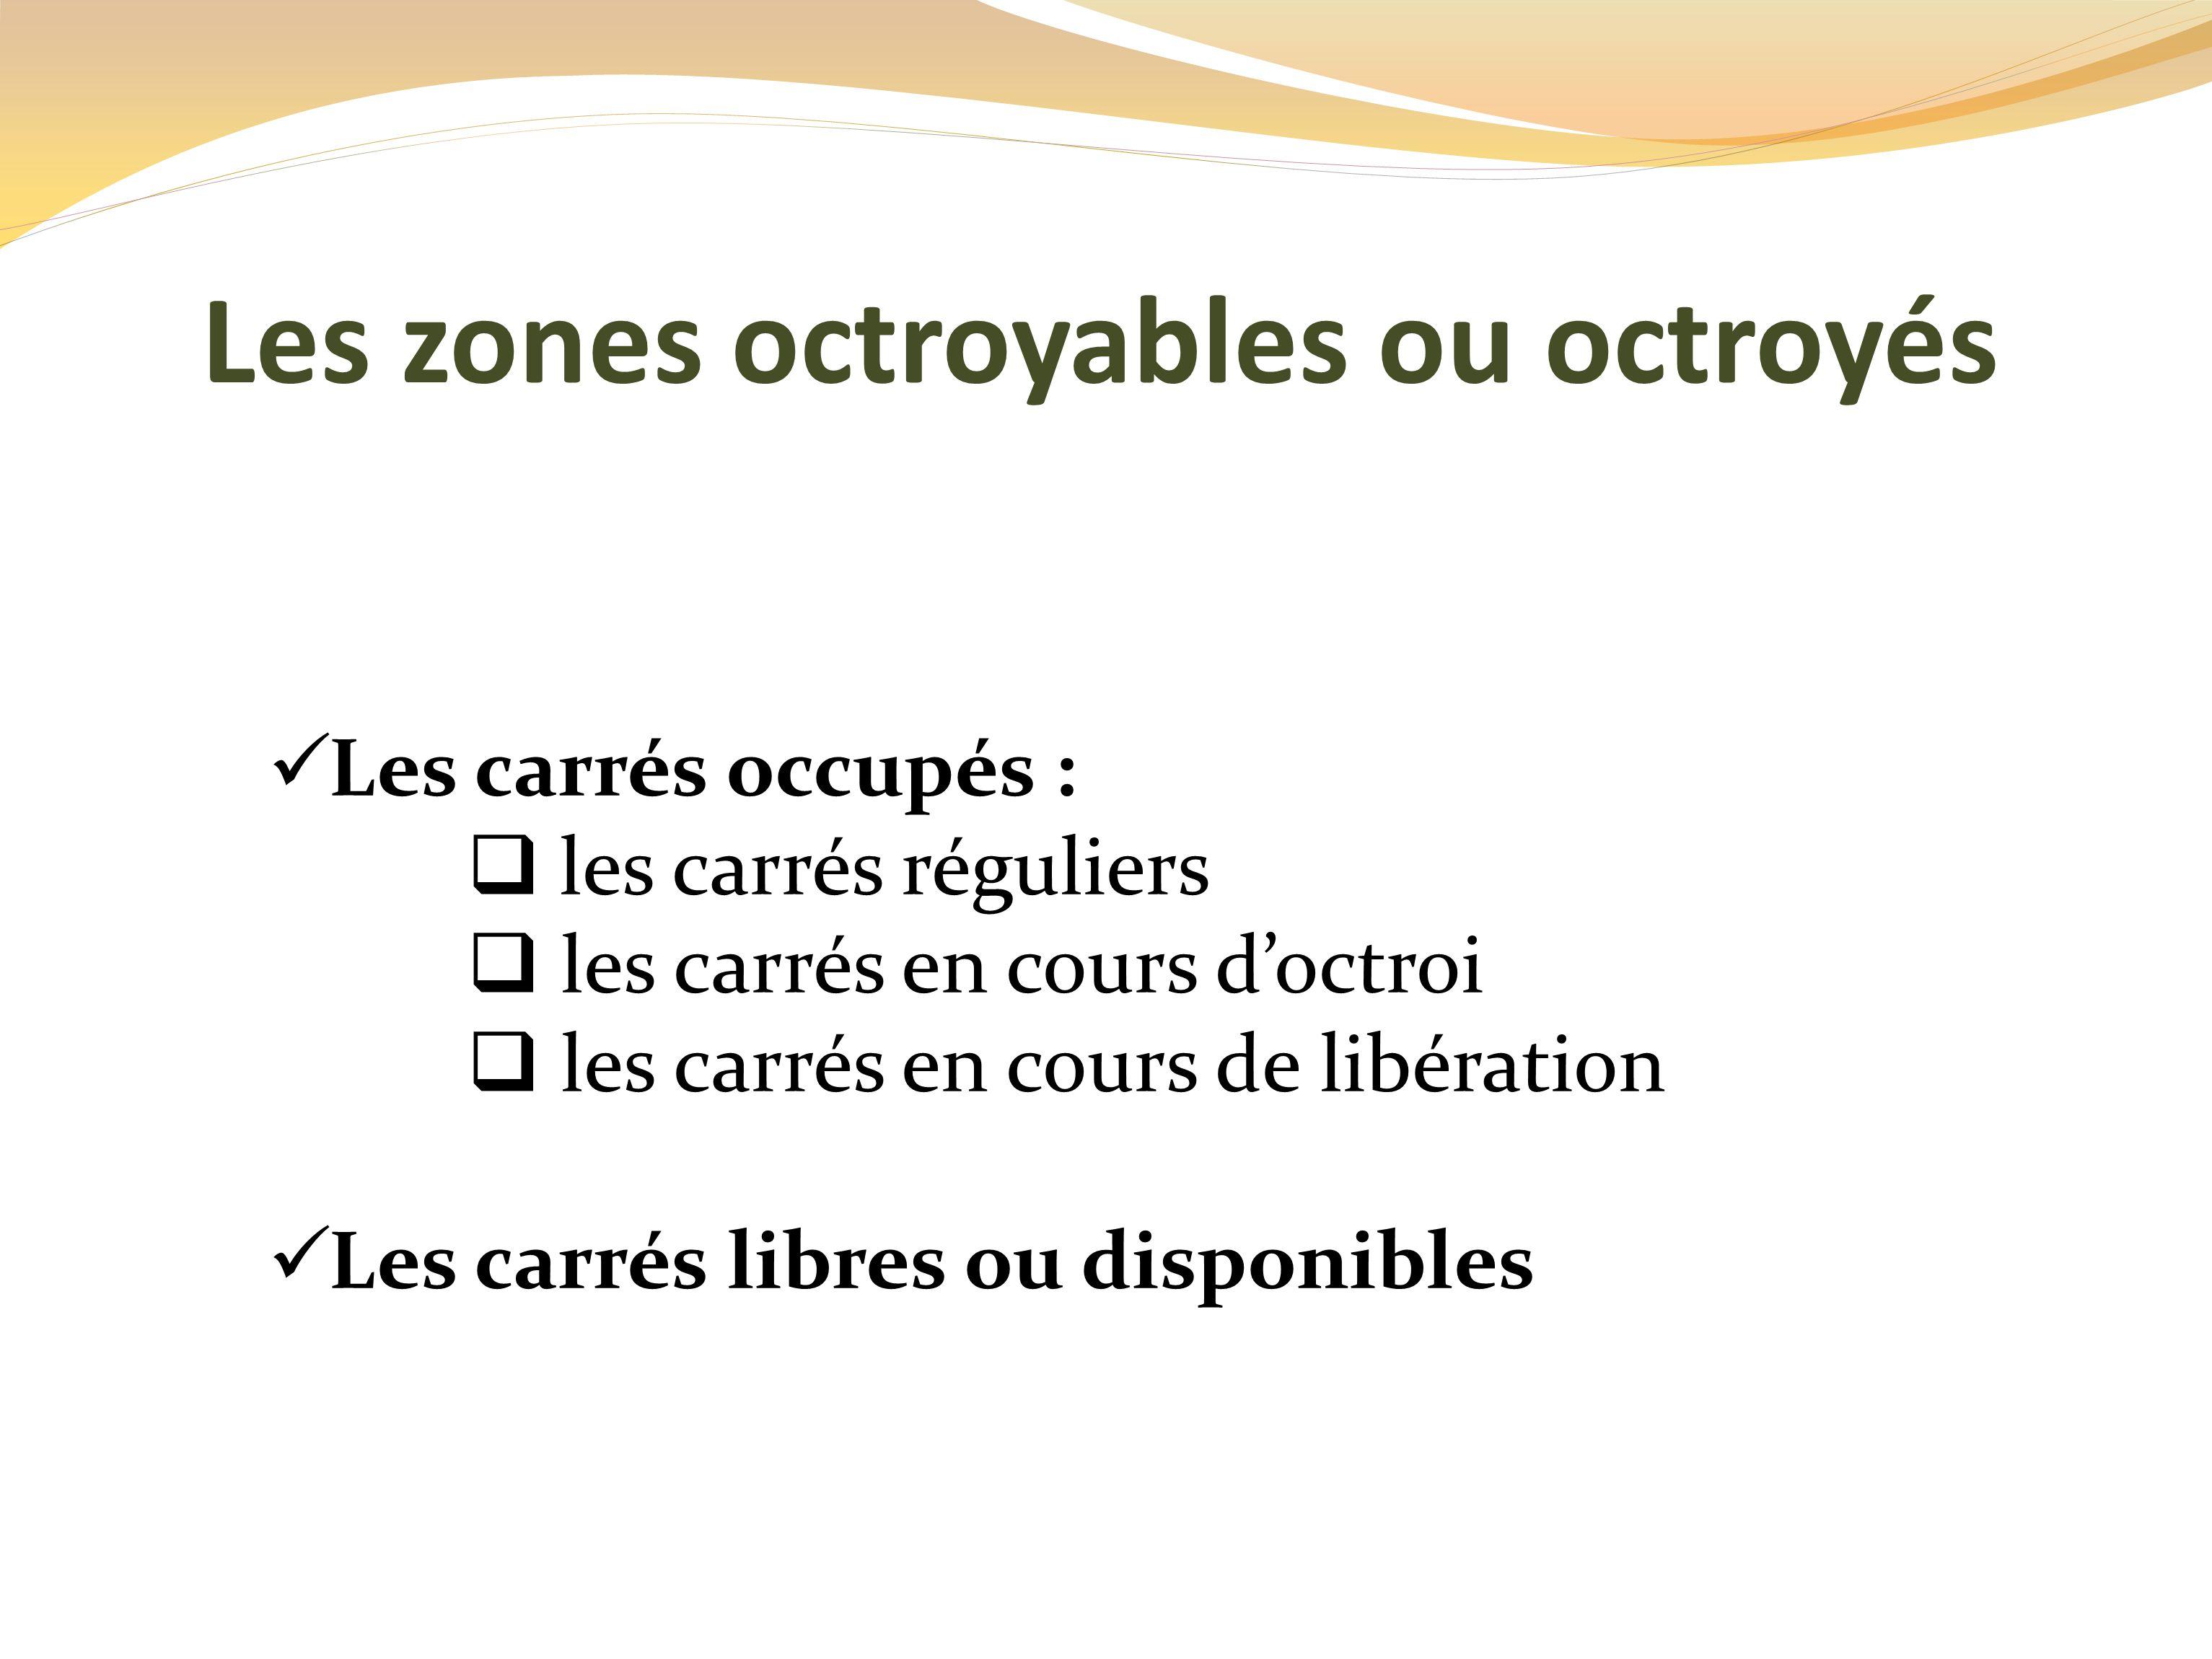 Les zones octroyables ou octroyés